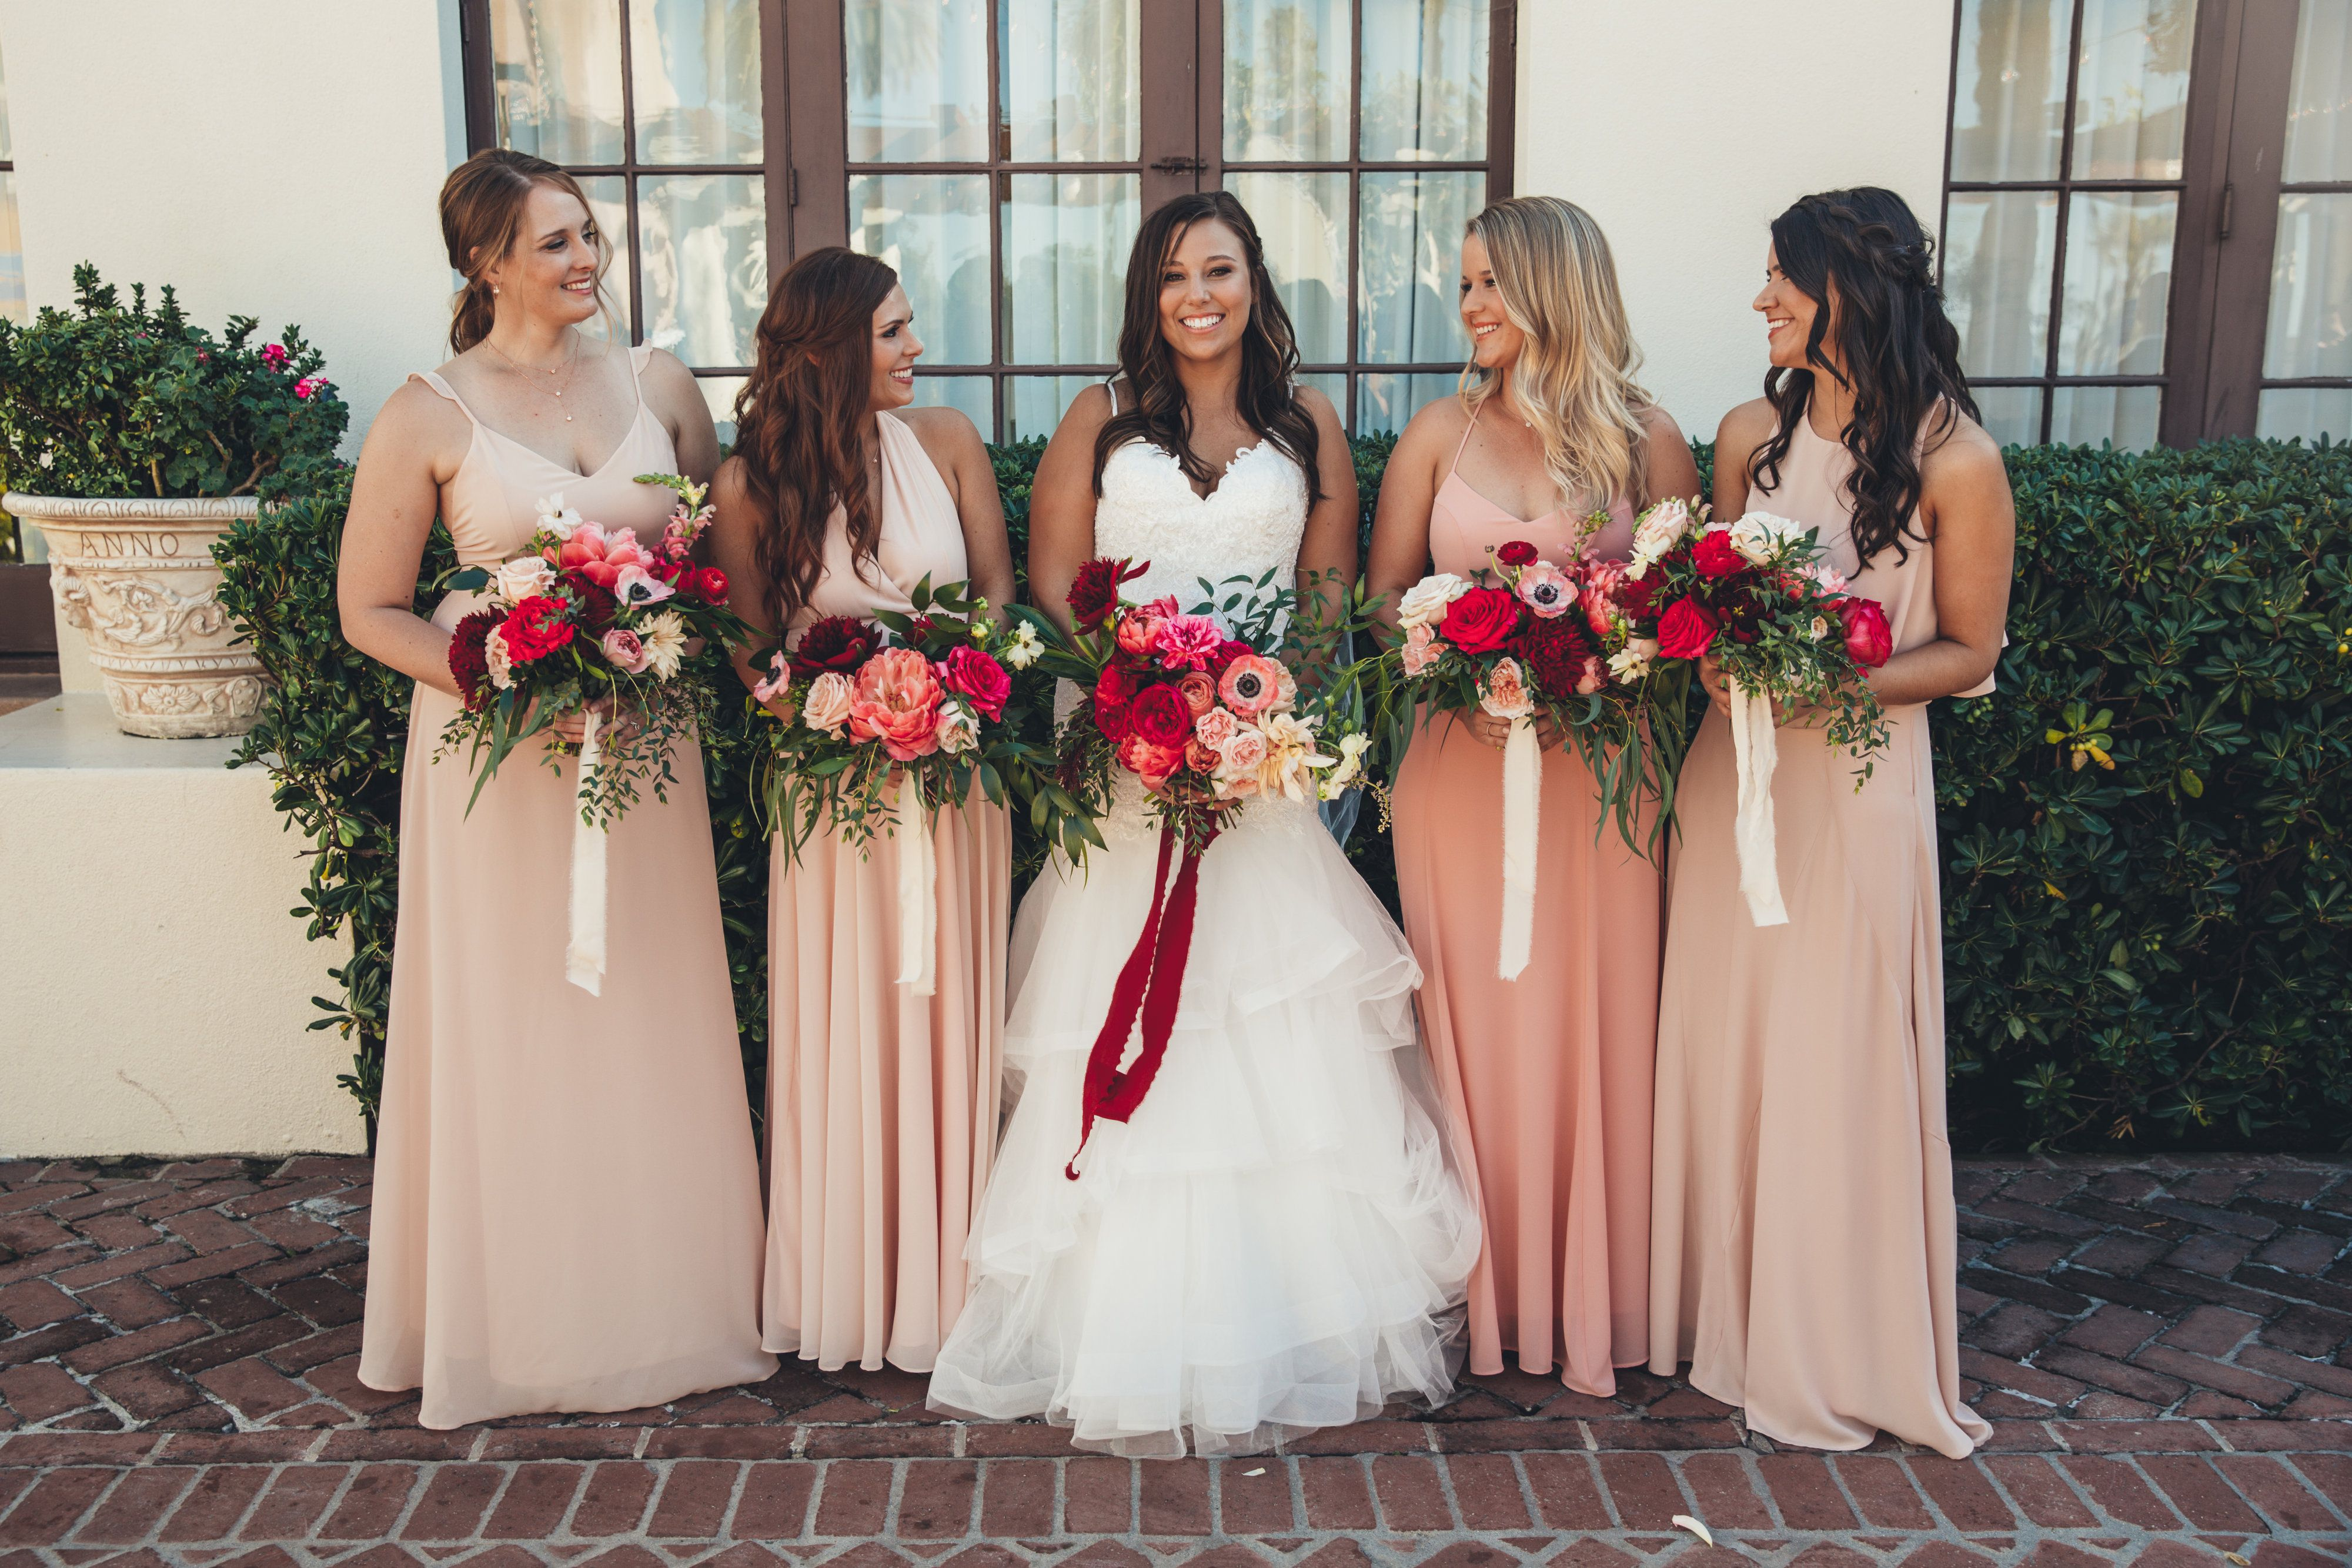 Bright Pink Hot Pink Bouquets Blush Bridesmaid Dresses For La